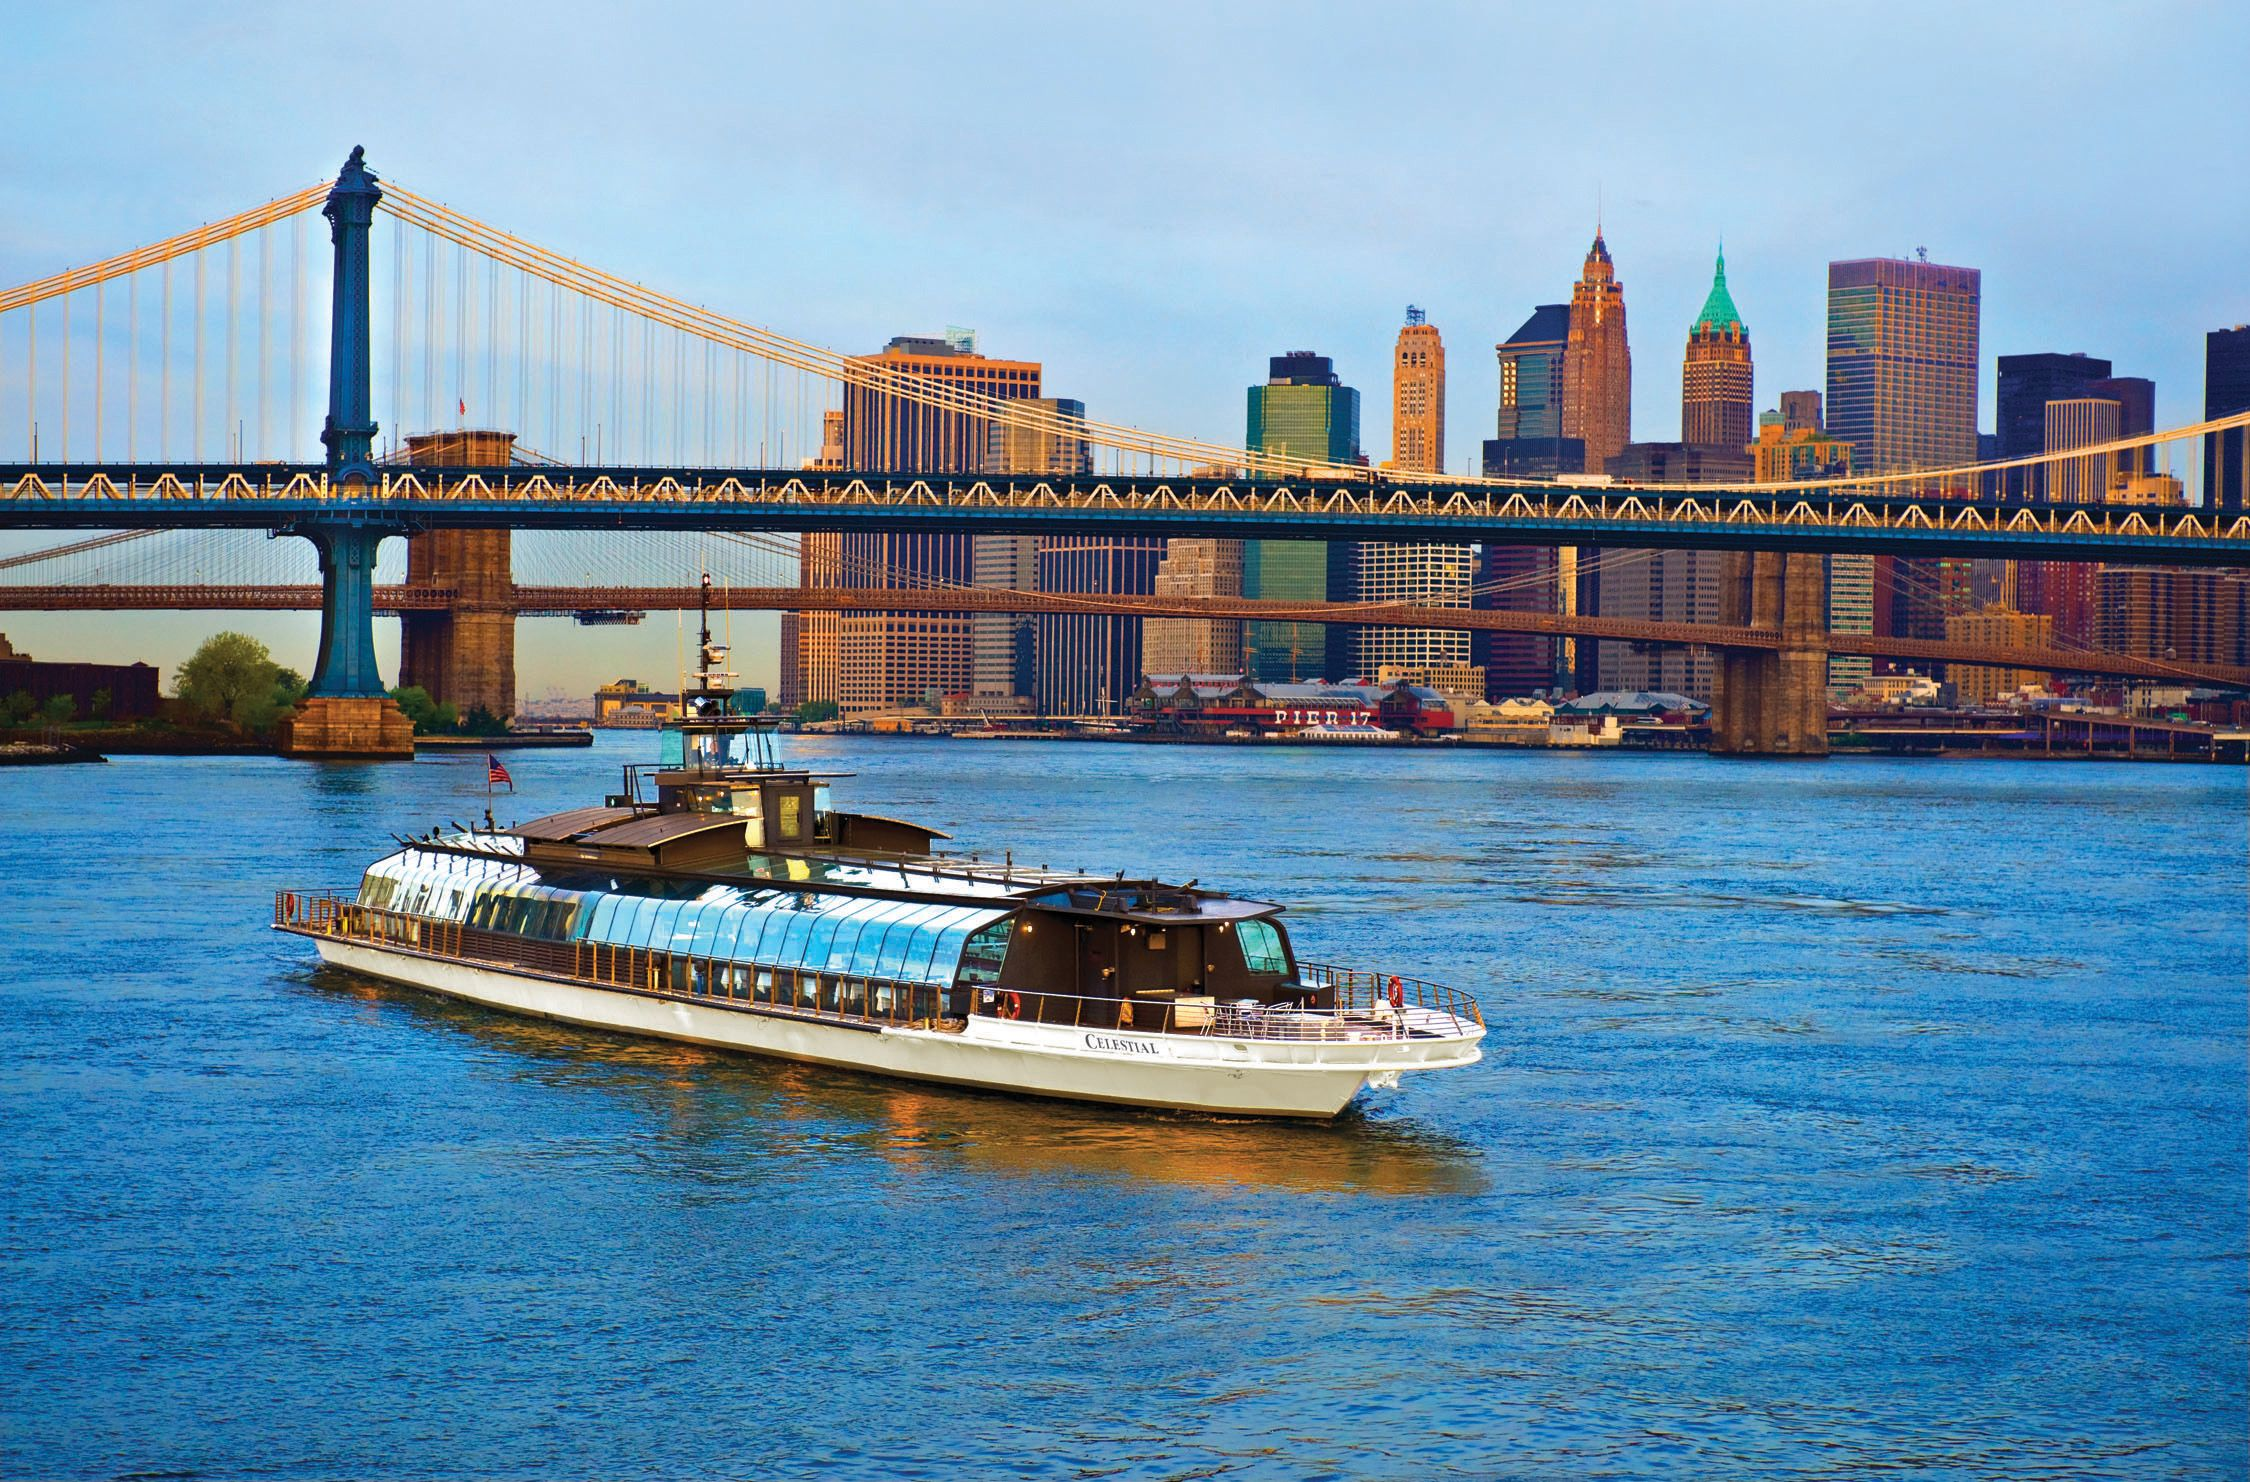 Bateaux New York Dinner Cruise New York City